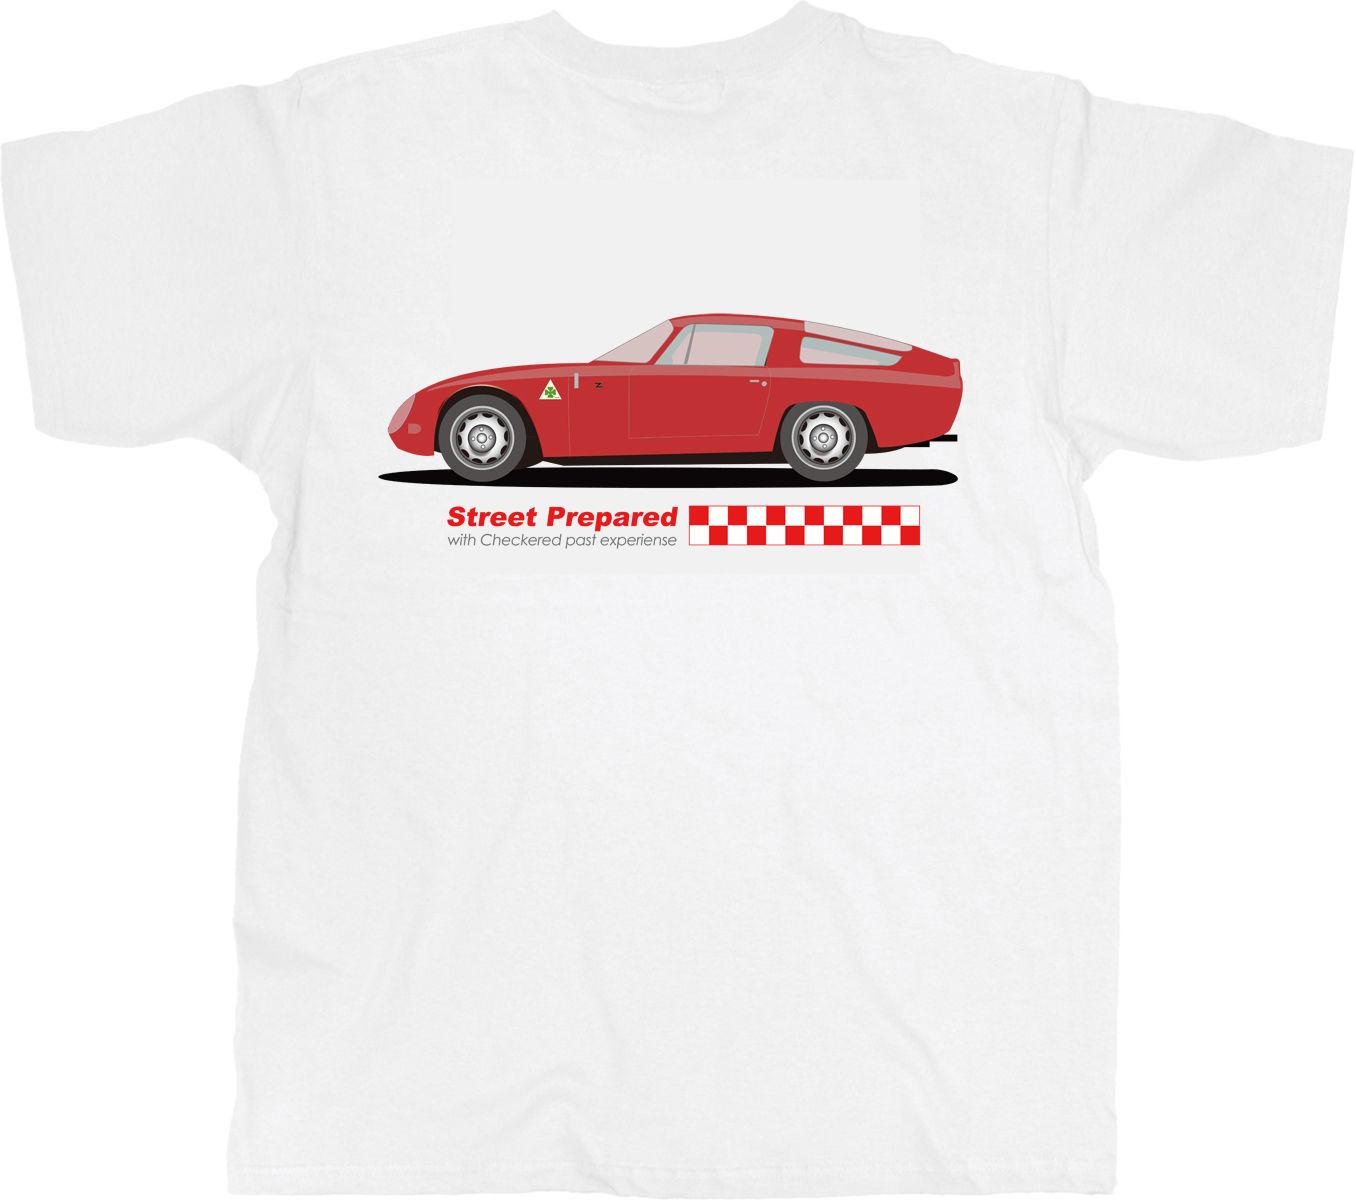 SP034 AR TZ1v2 T-shirt